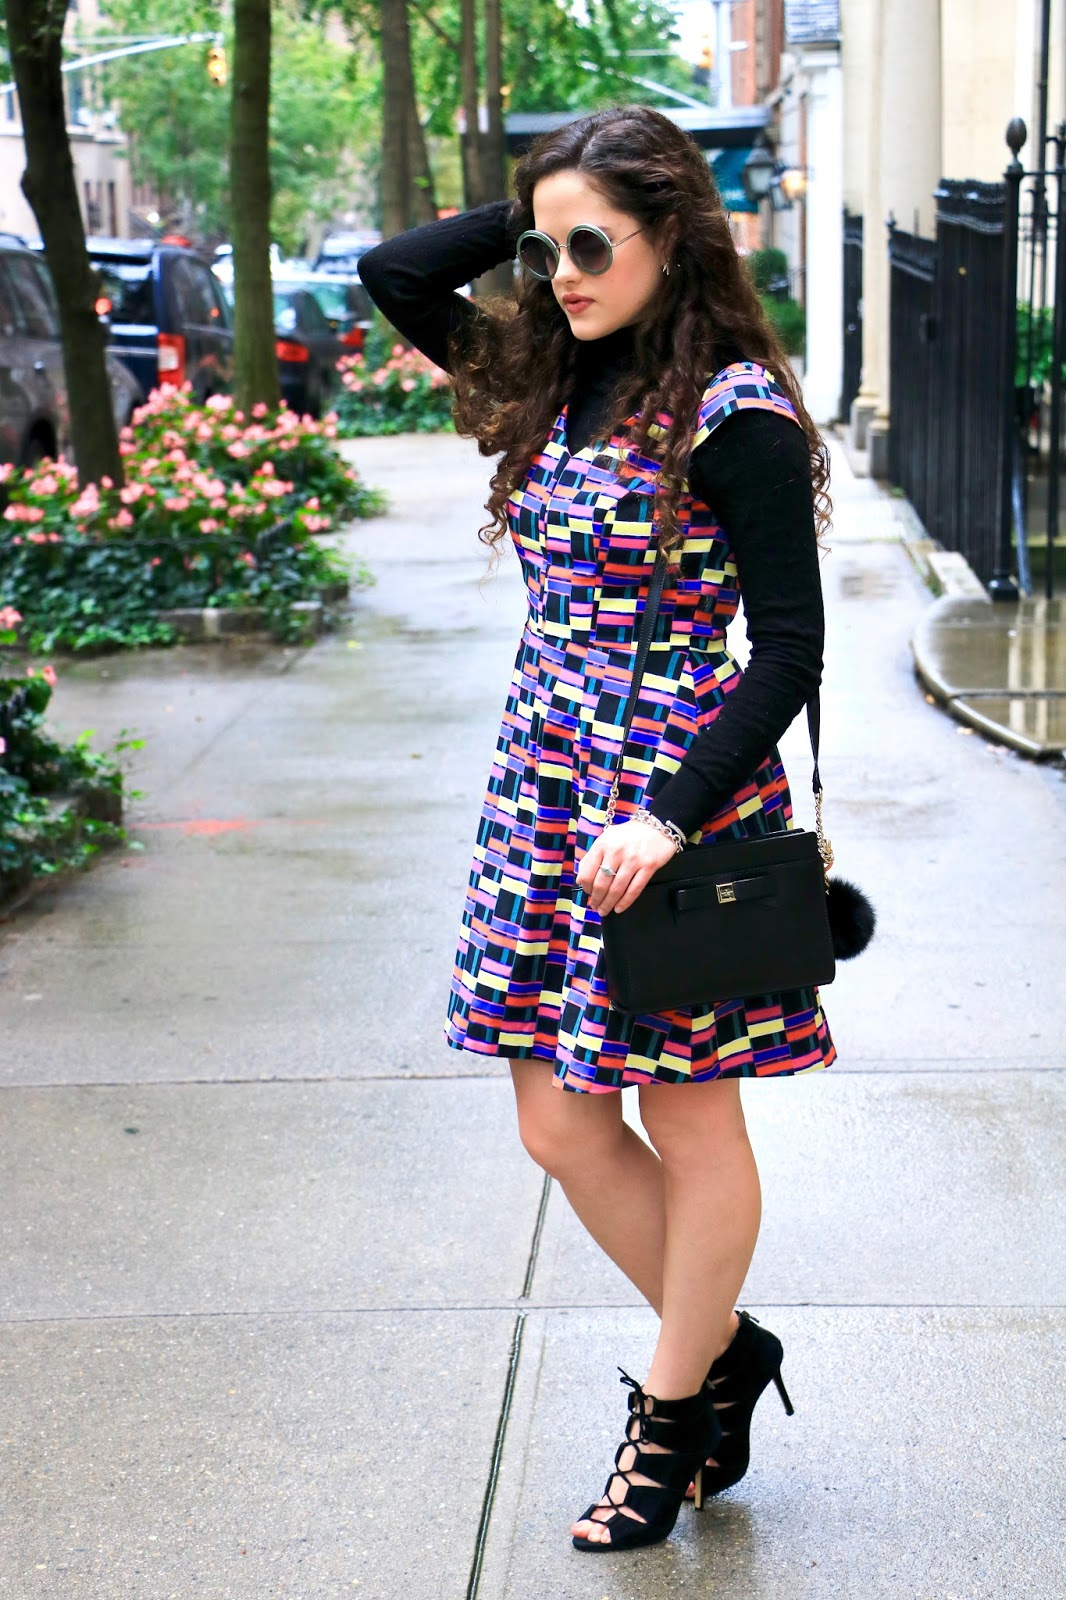 nyc fashion blogger street style